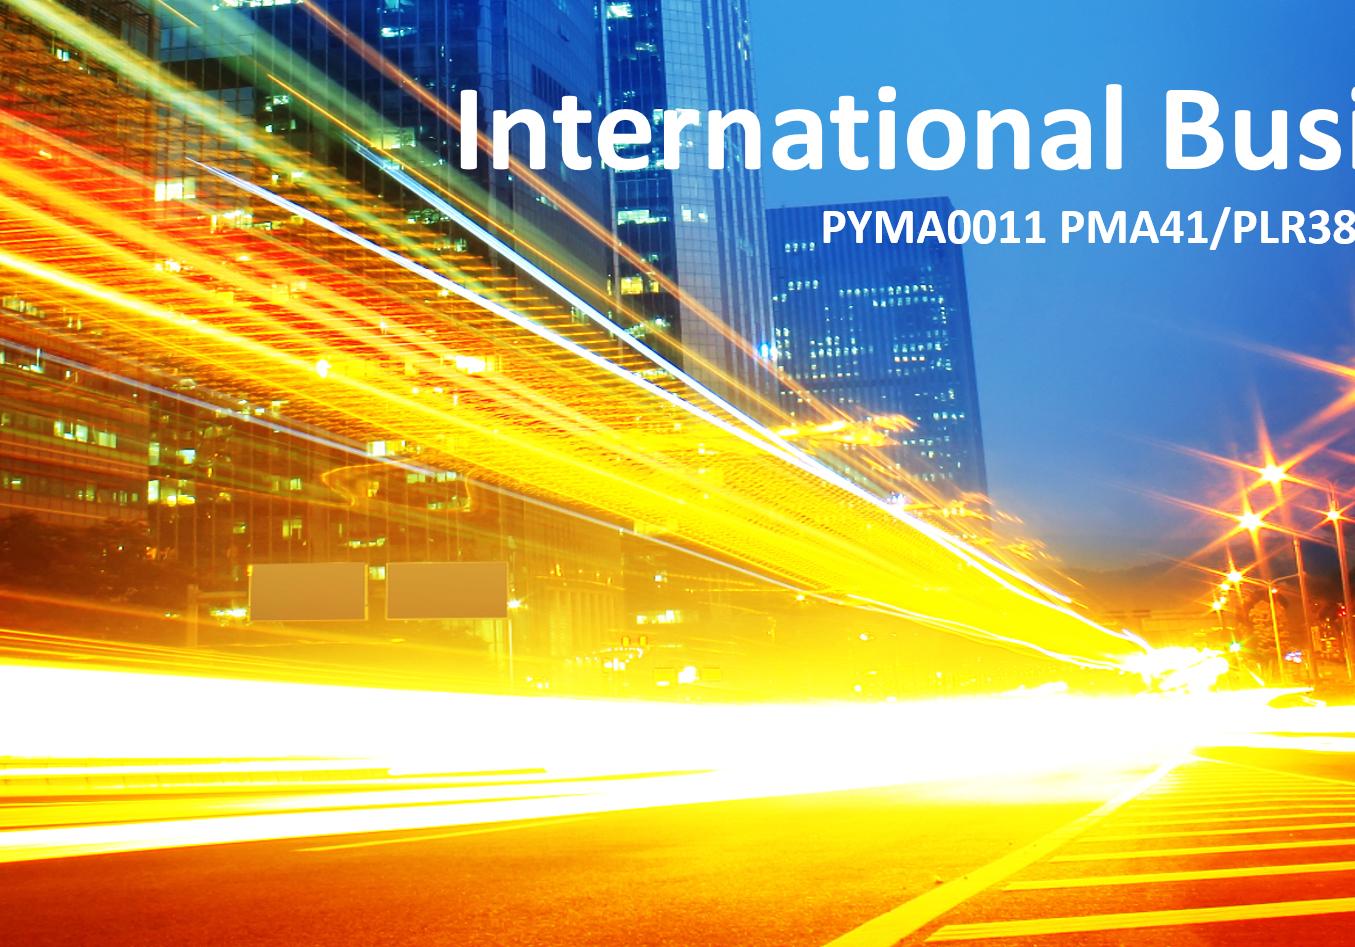 International Business - Presentation  1.4.2019 at UTU Pori